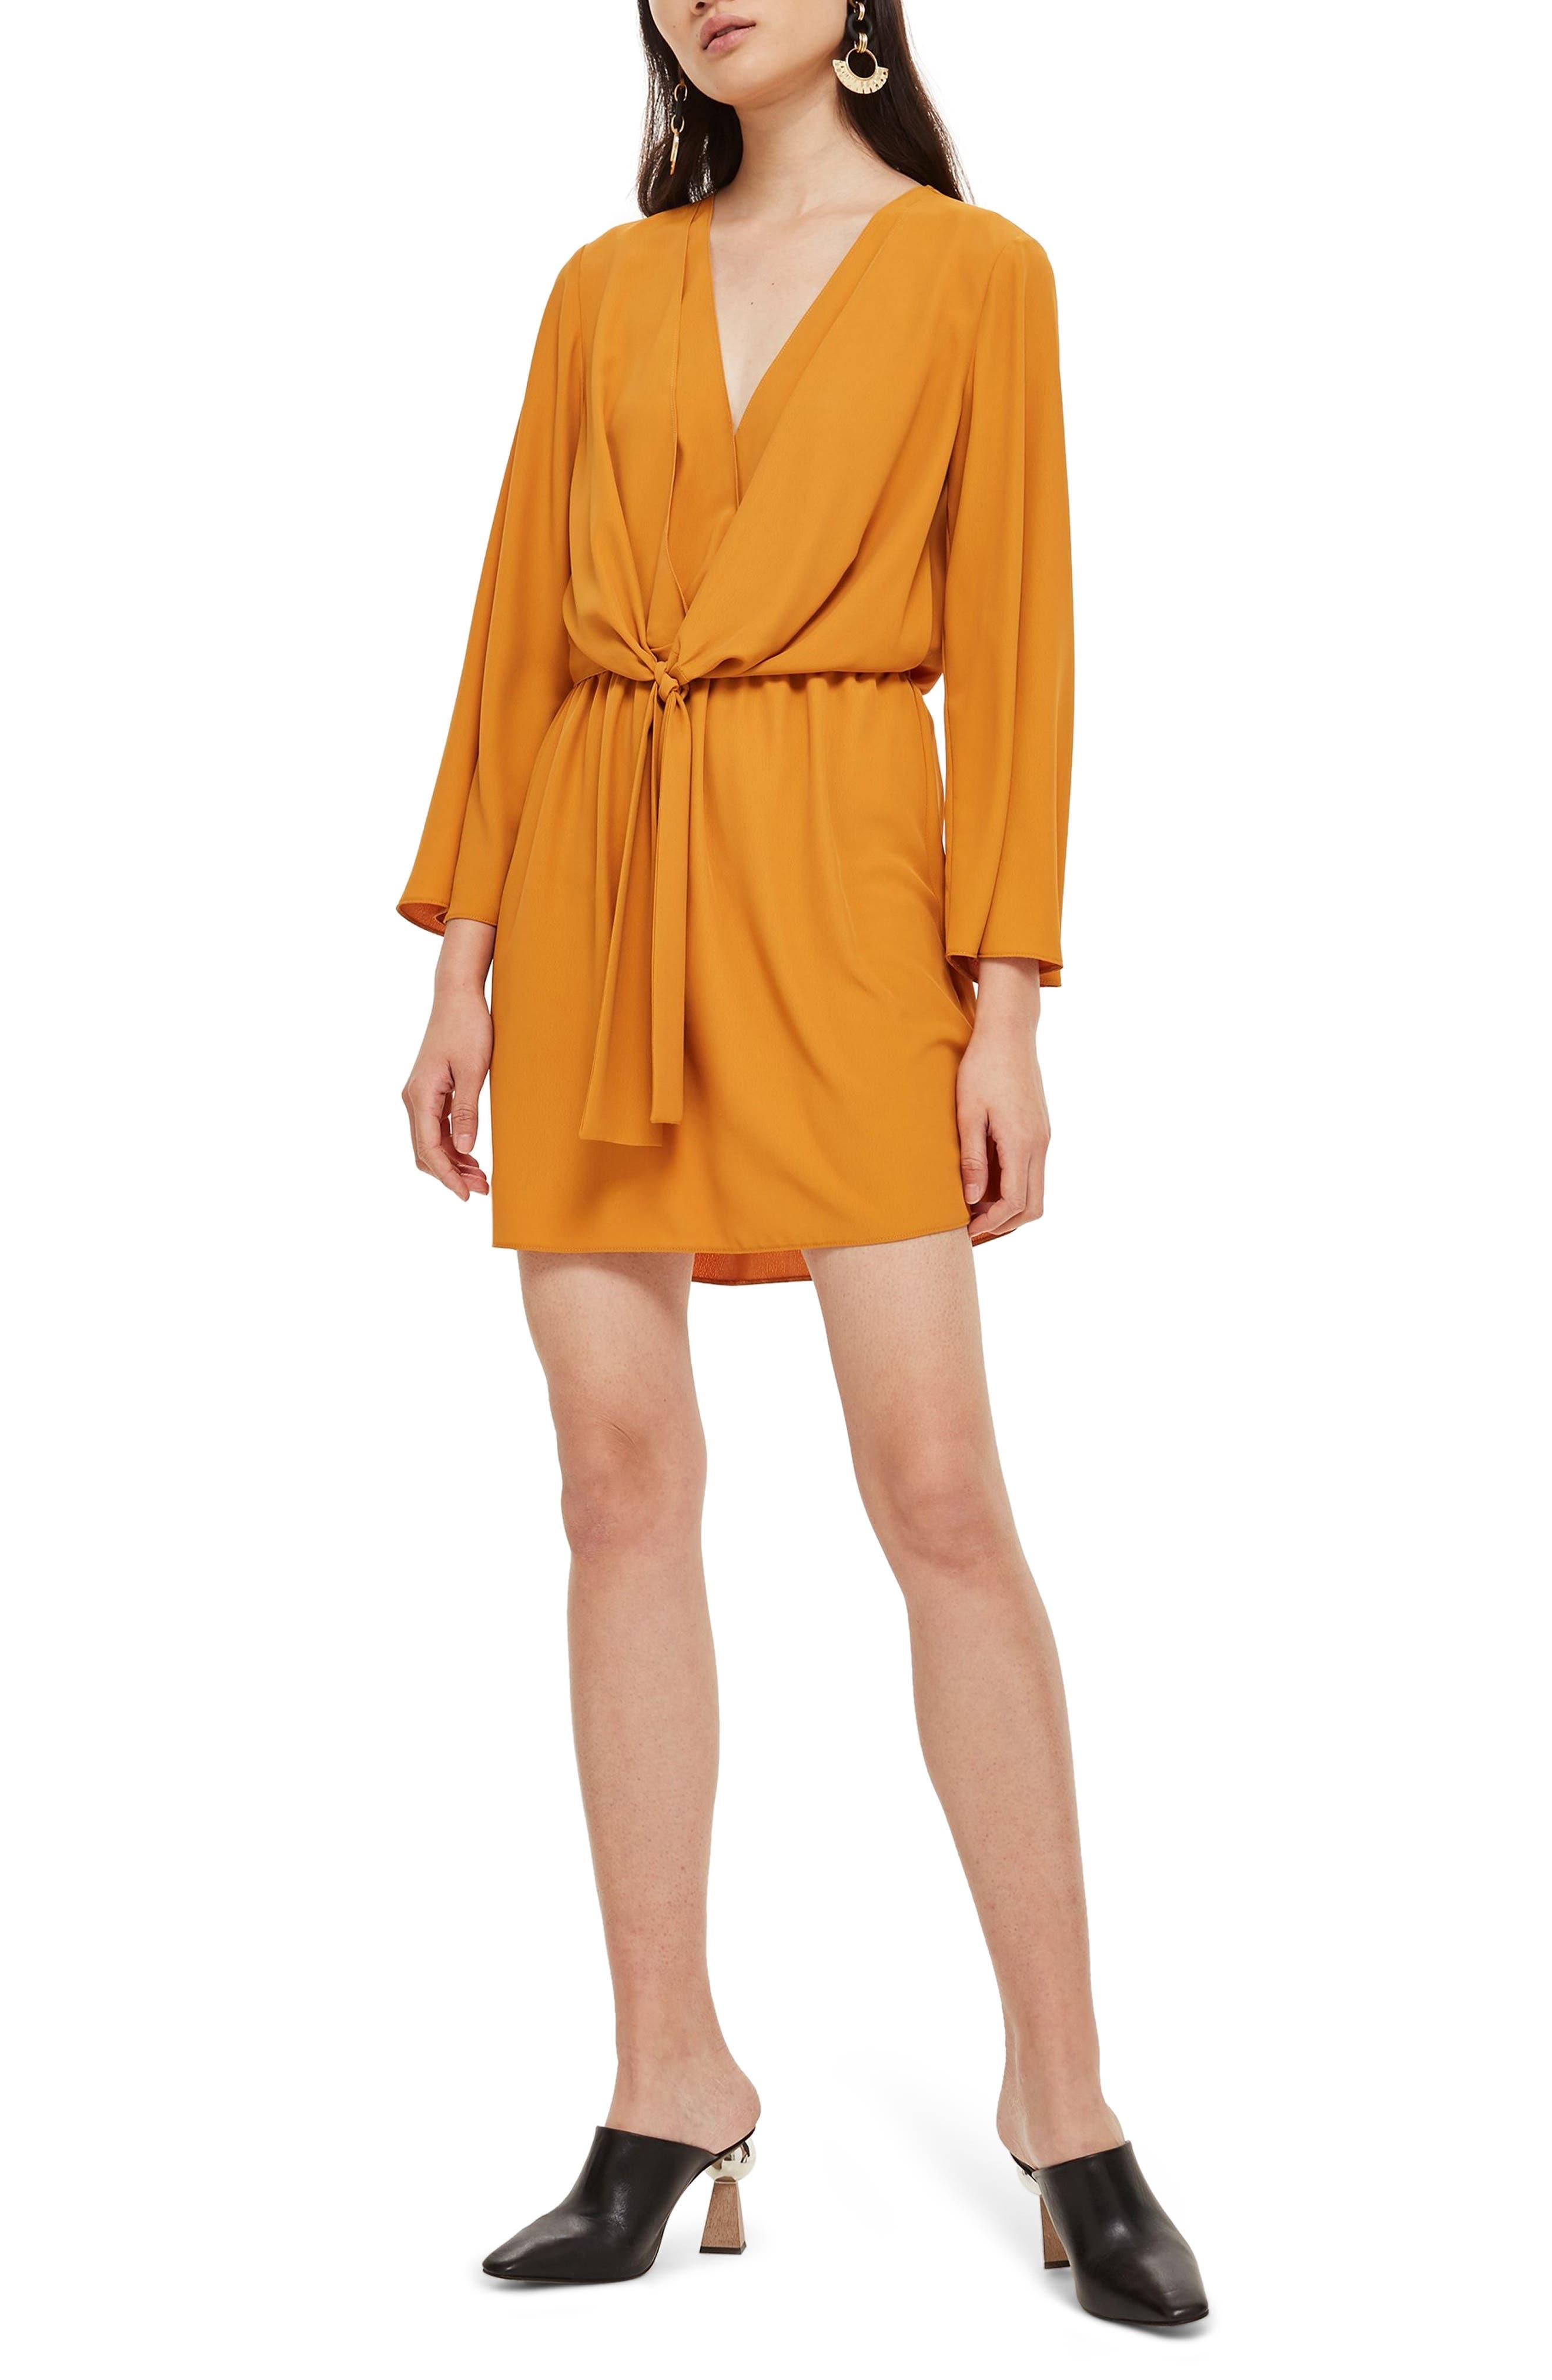 70s Dresses – Disco Dresses, Hippie Dresses, Wrap Dresses Womens Topshop Tiffany Knot Minidress Size 0 US fits like 00 - Yellow $68.00 AT vintagedancer.com